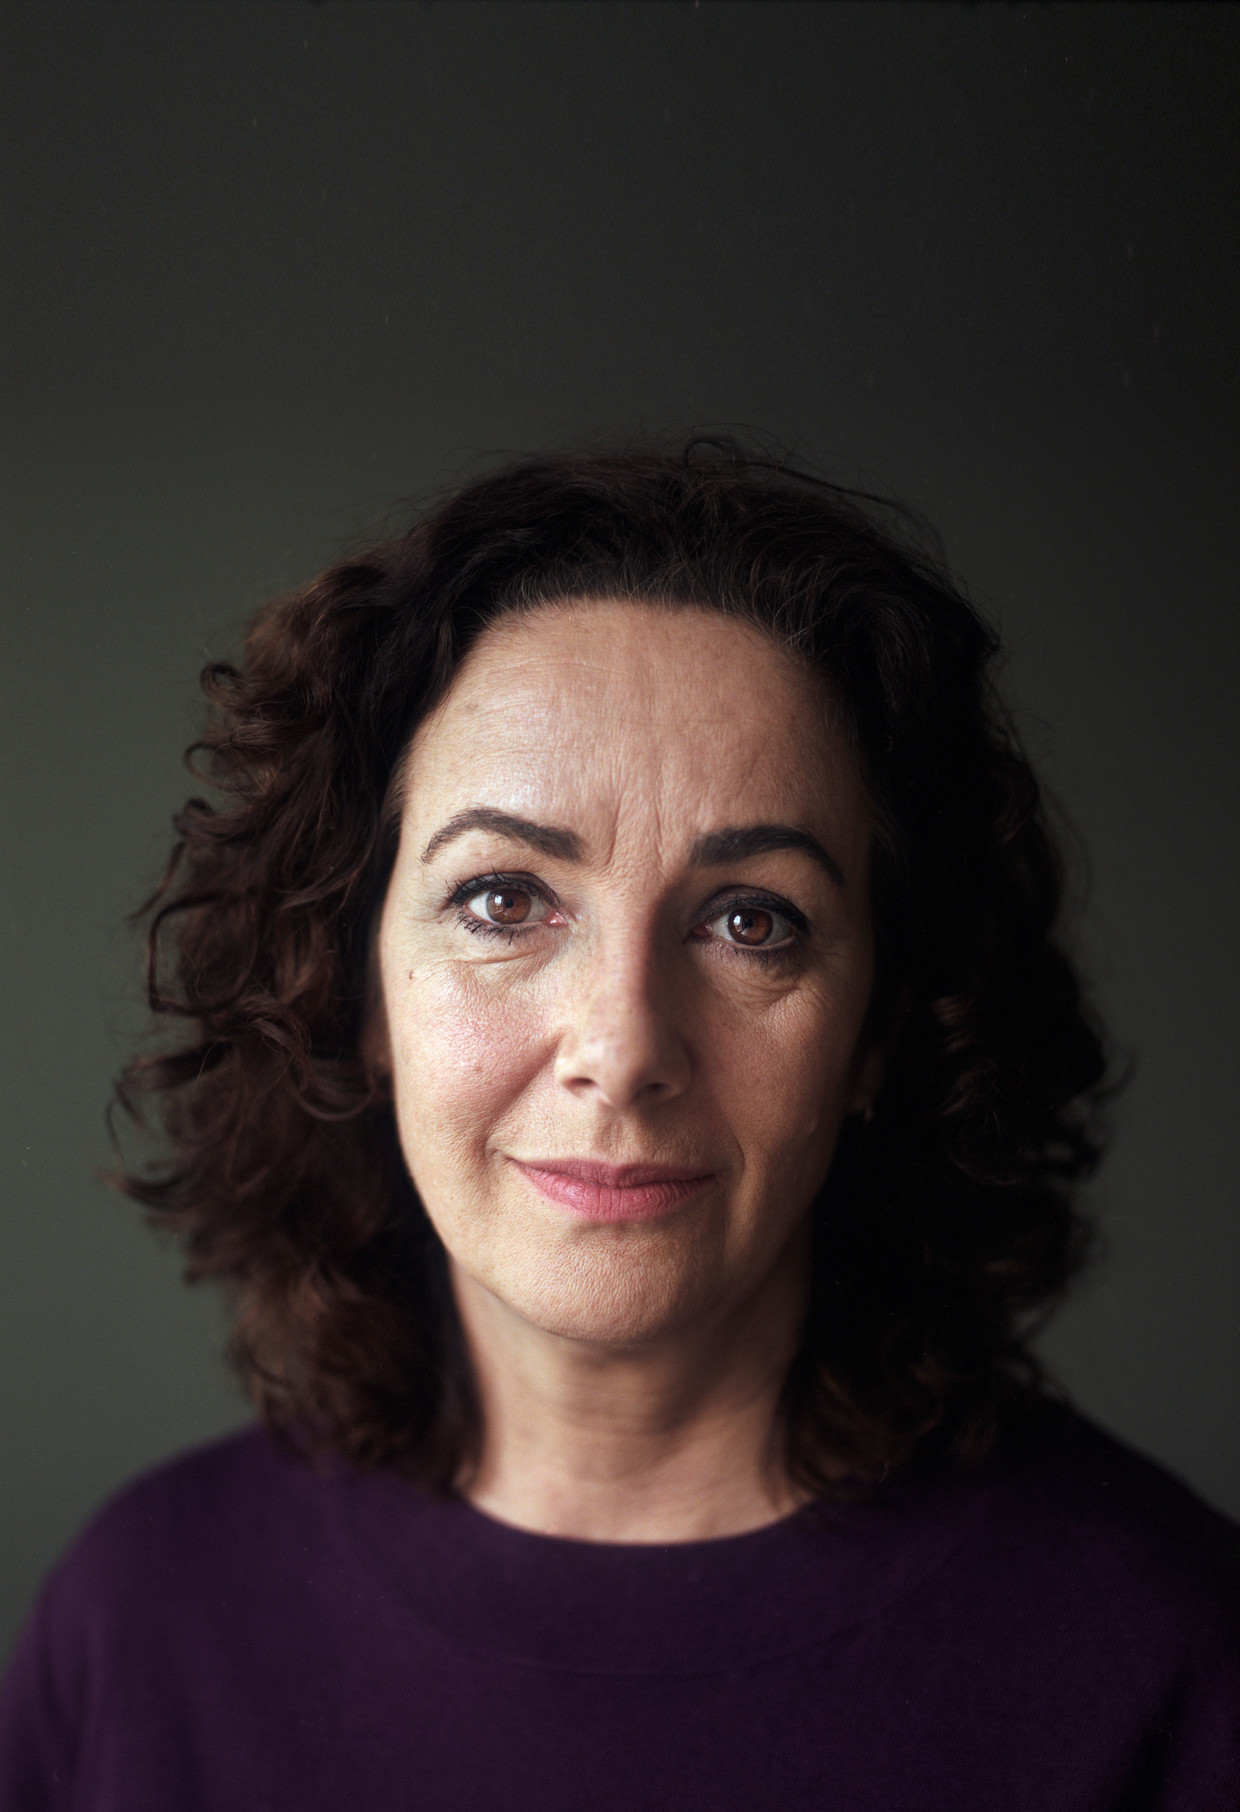 Femke Halsema, burgemeester van Amsterdam. Beeld Marc Driessen